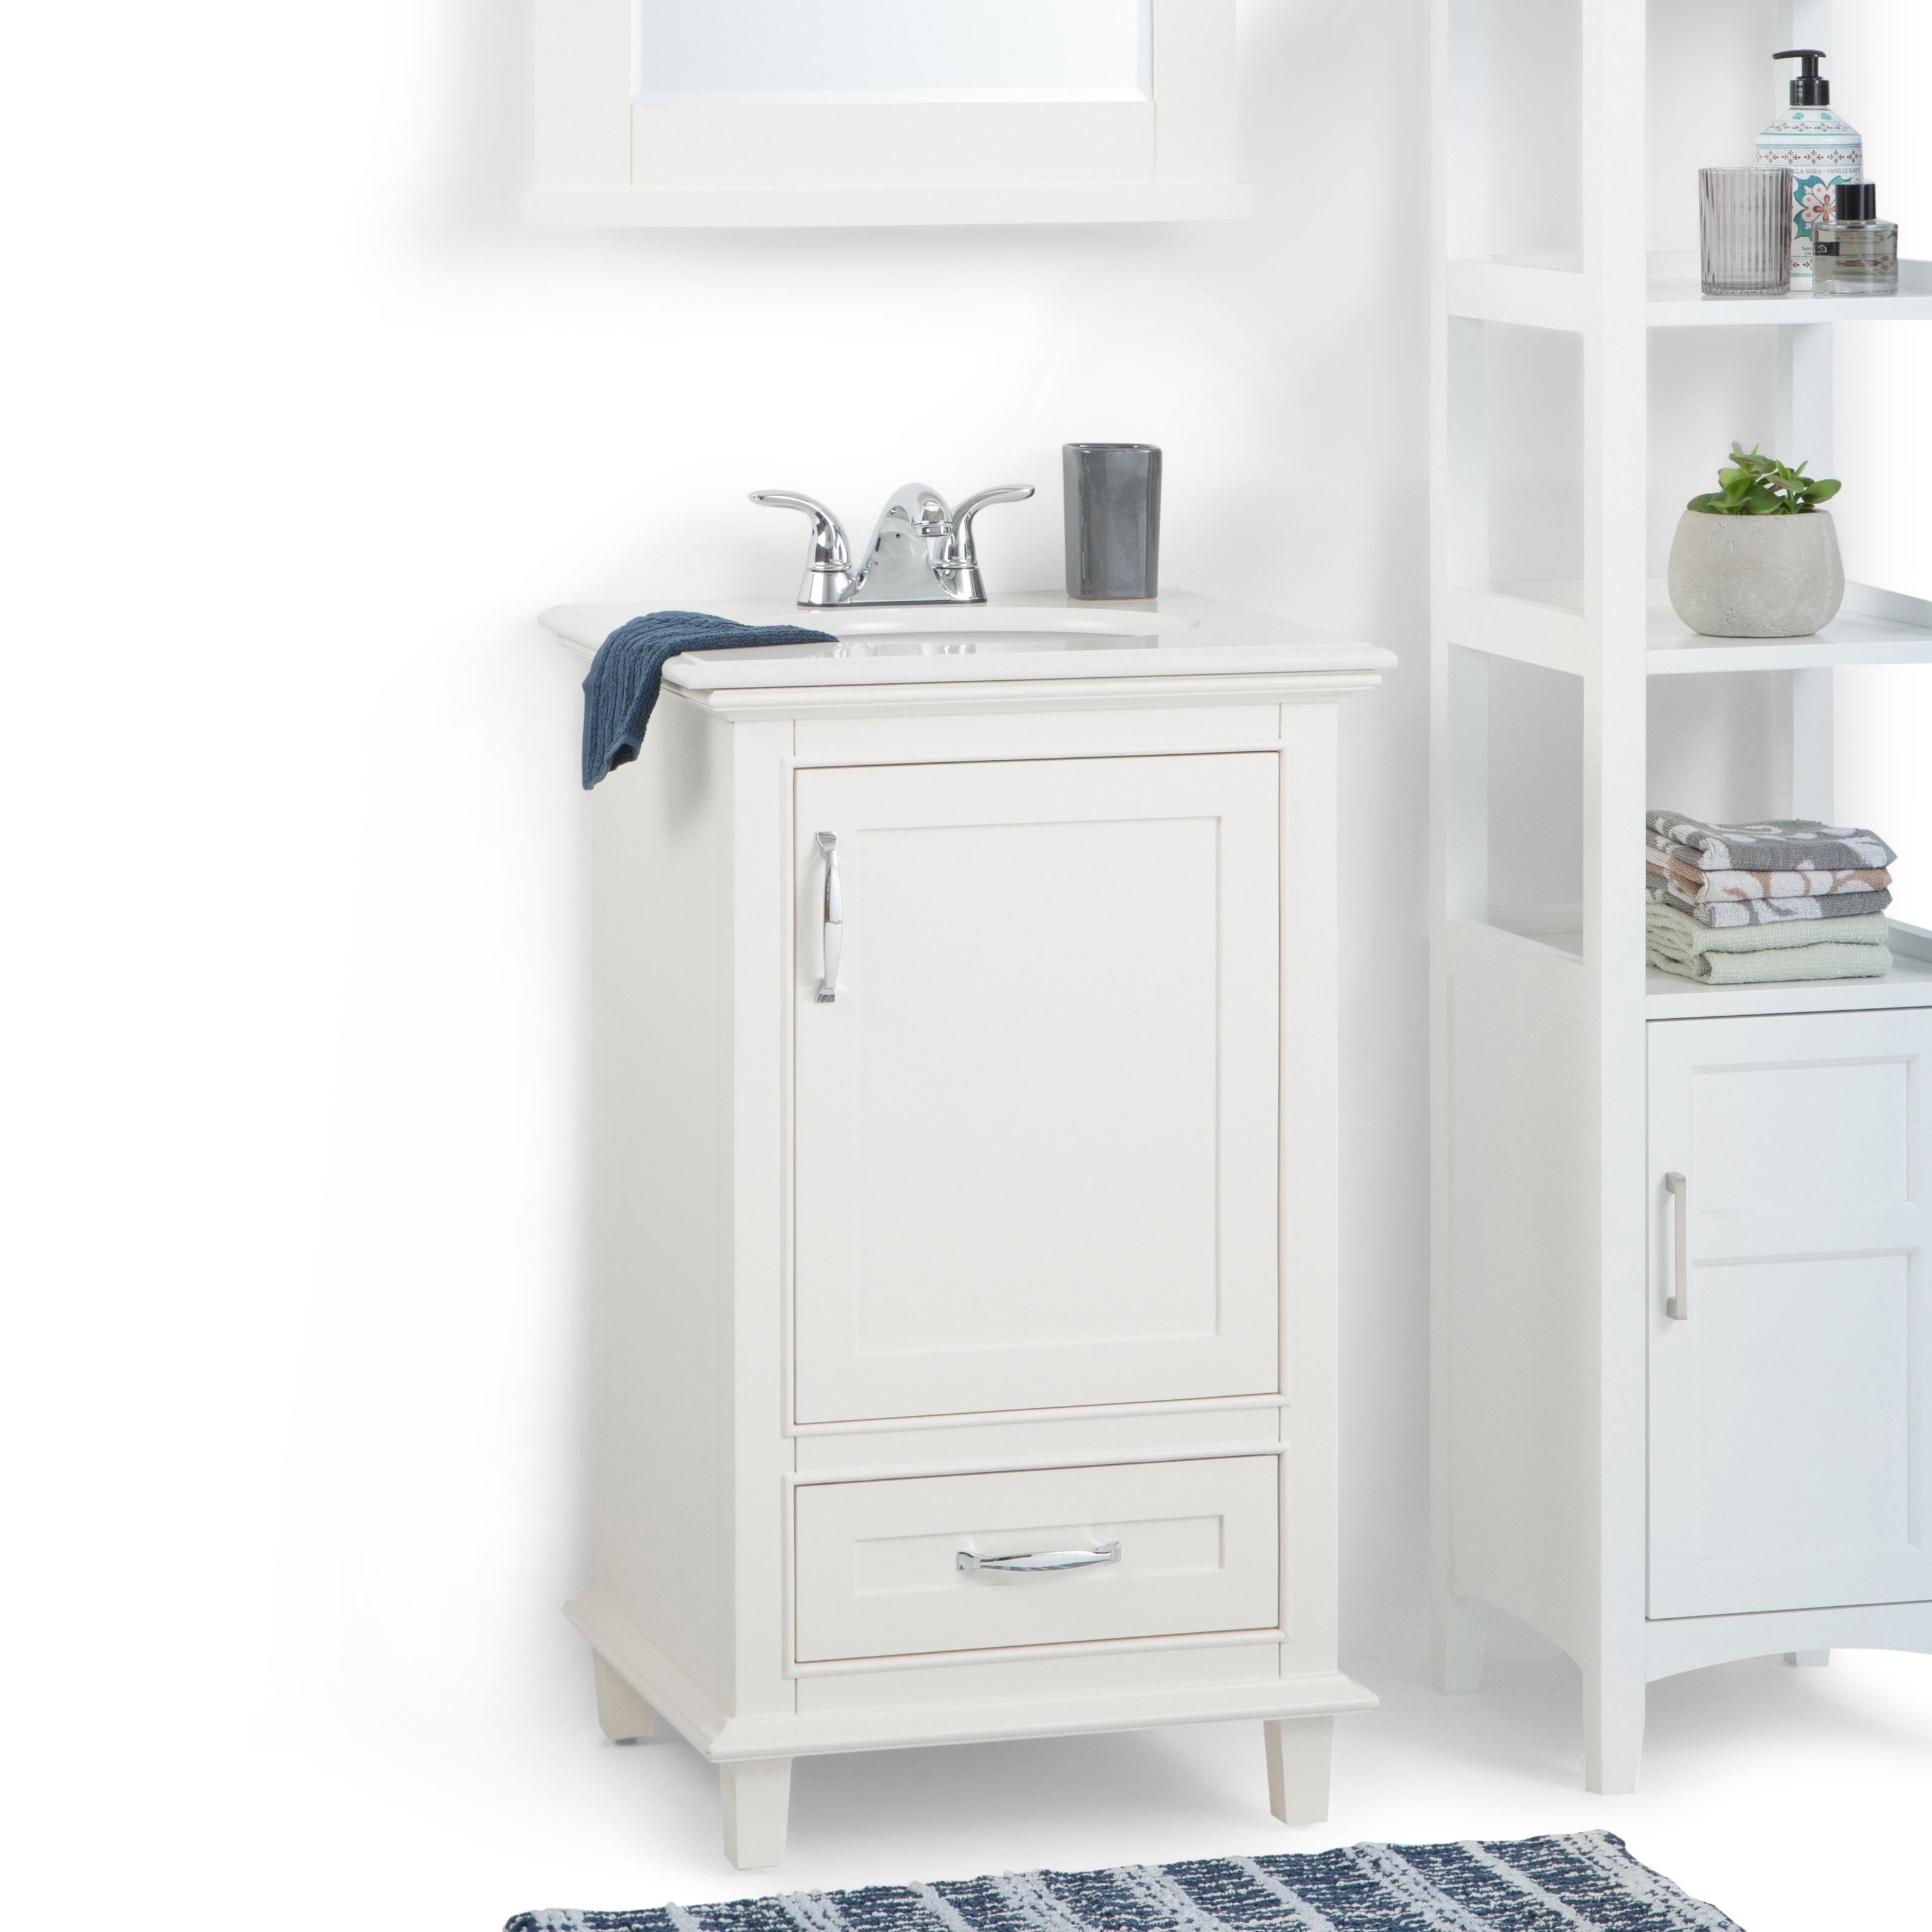 Wyndenhall Newton Bath Vanity With Bombay Engineered Quartz Marble Top Overstock 14332550 Soft White 24 Inch